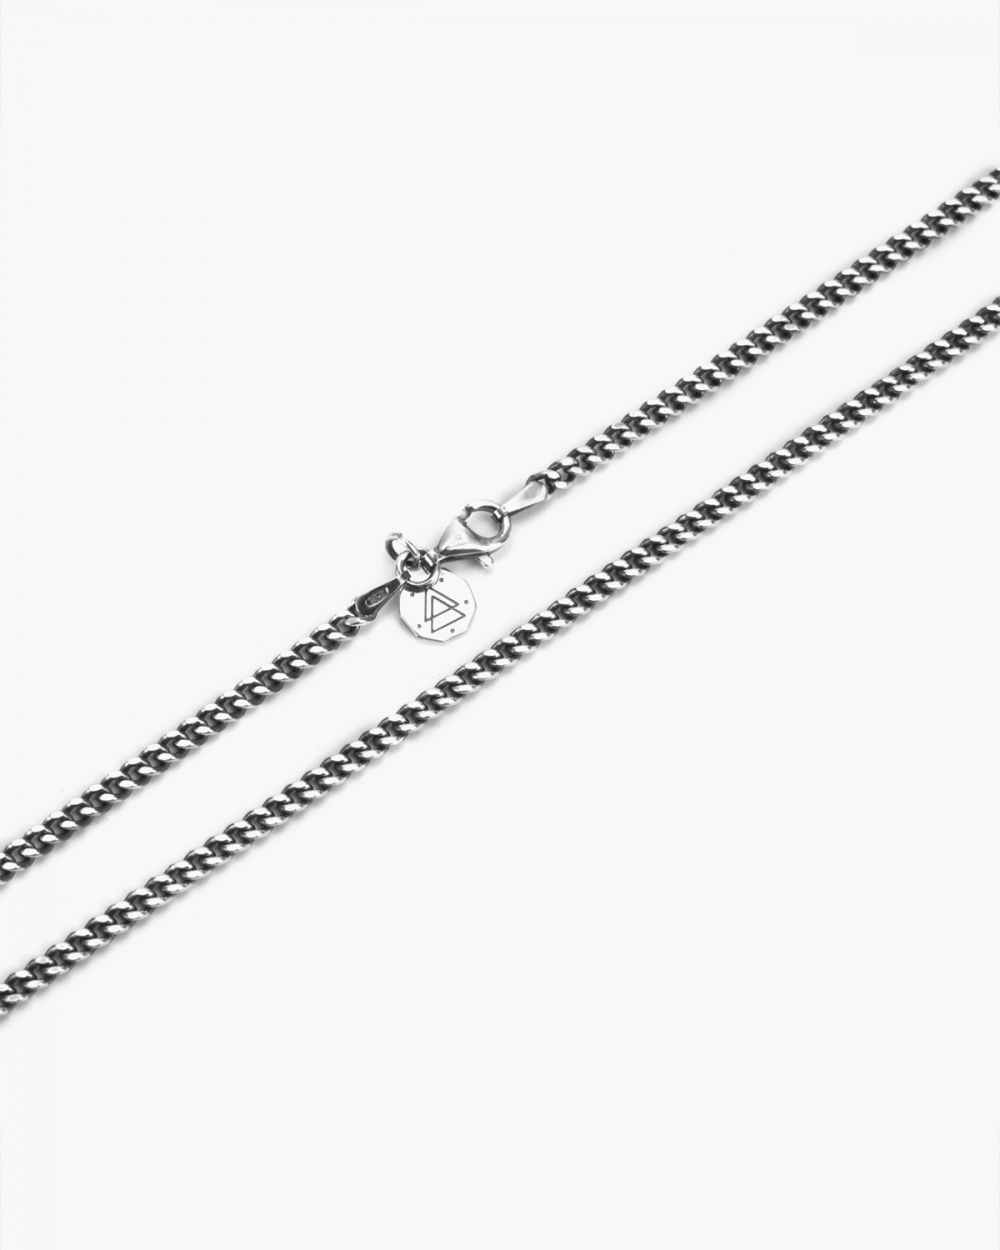 Necklaces CURB CHAIN NECKLACE 080 NOVE25